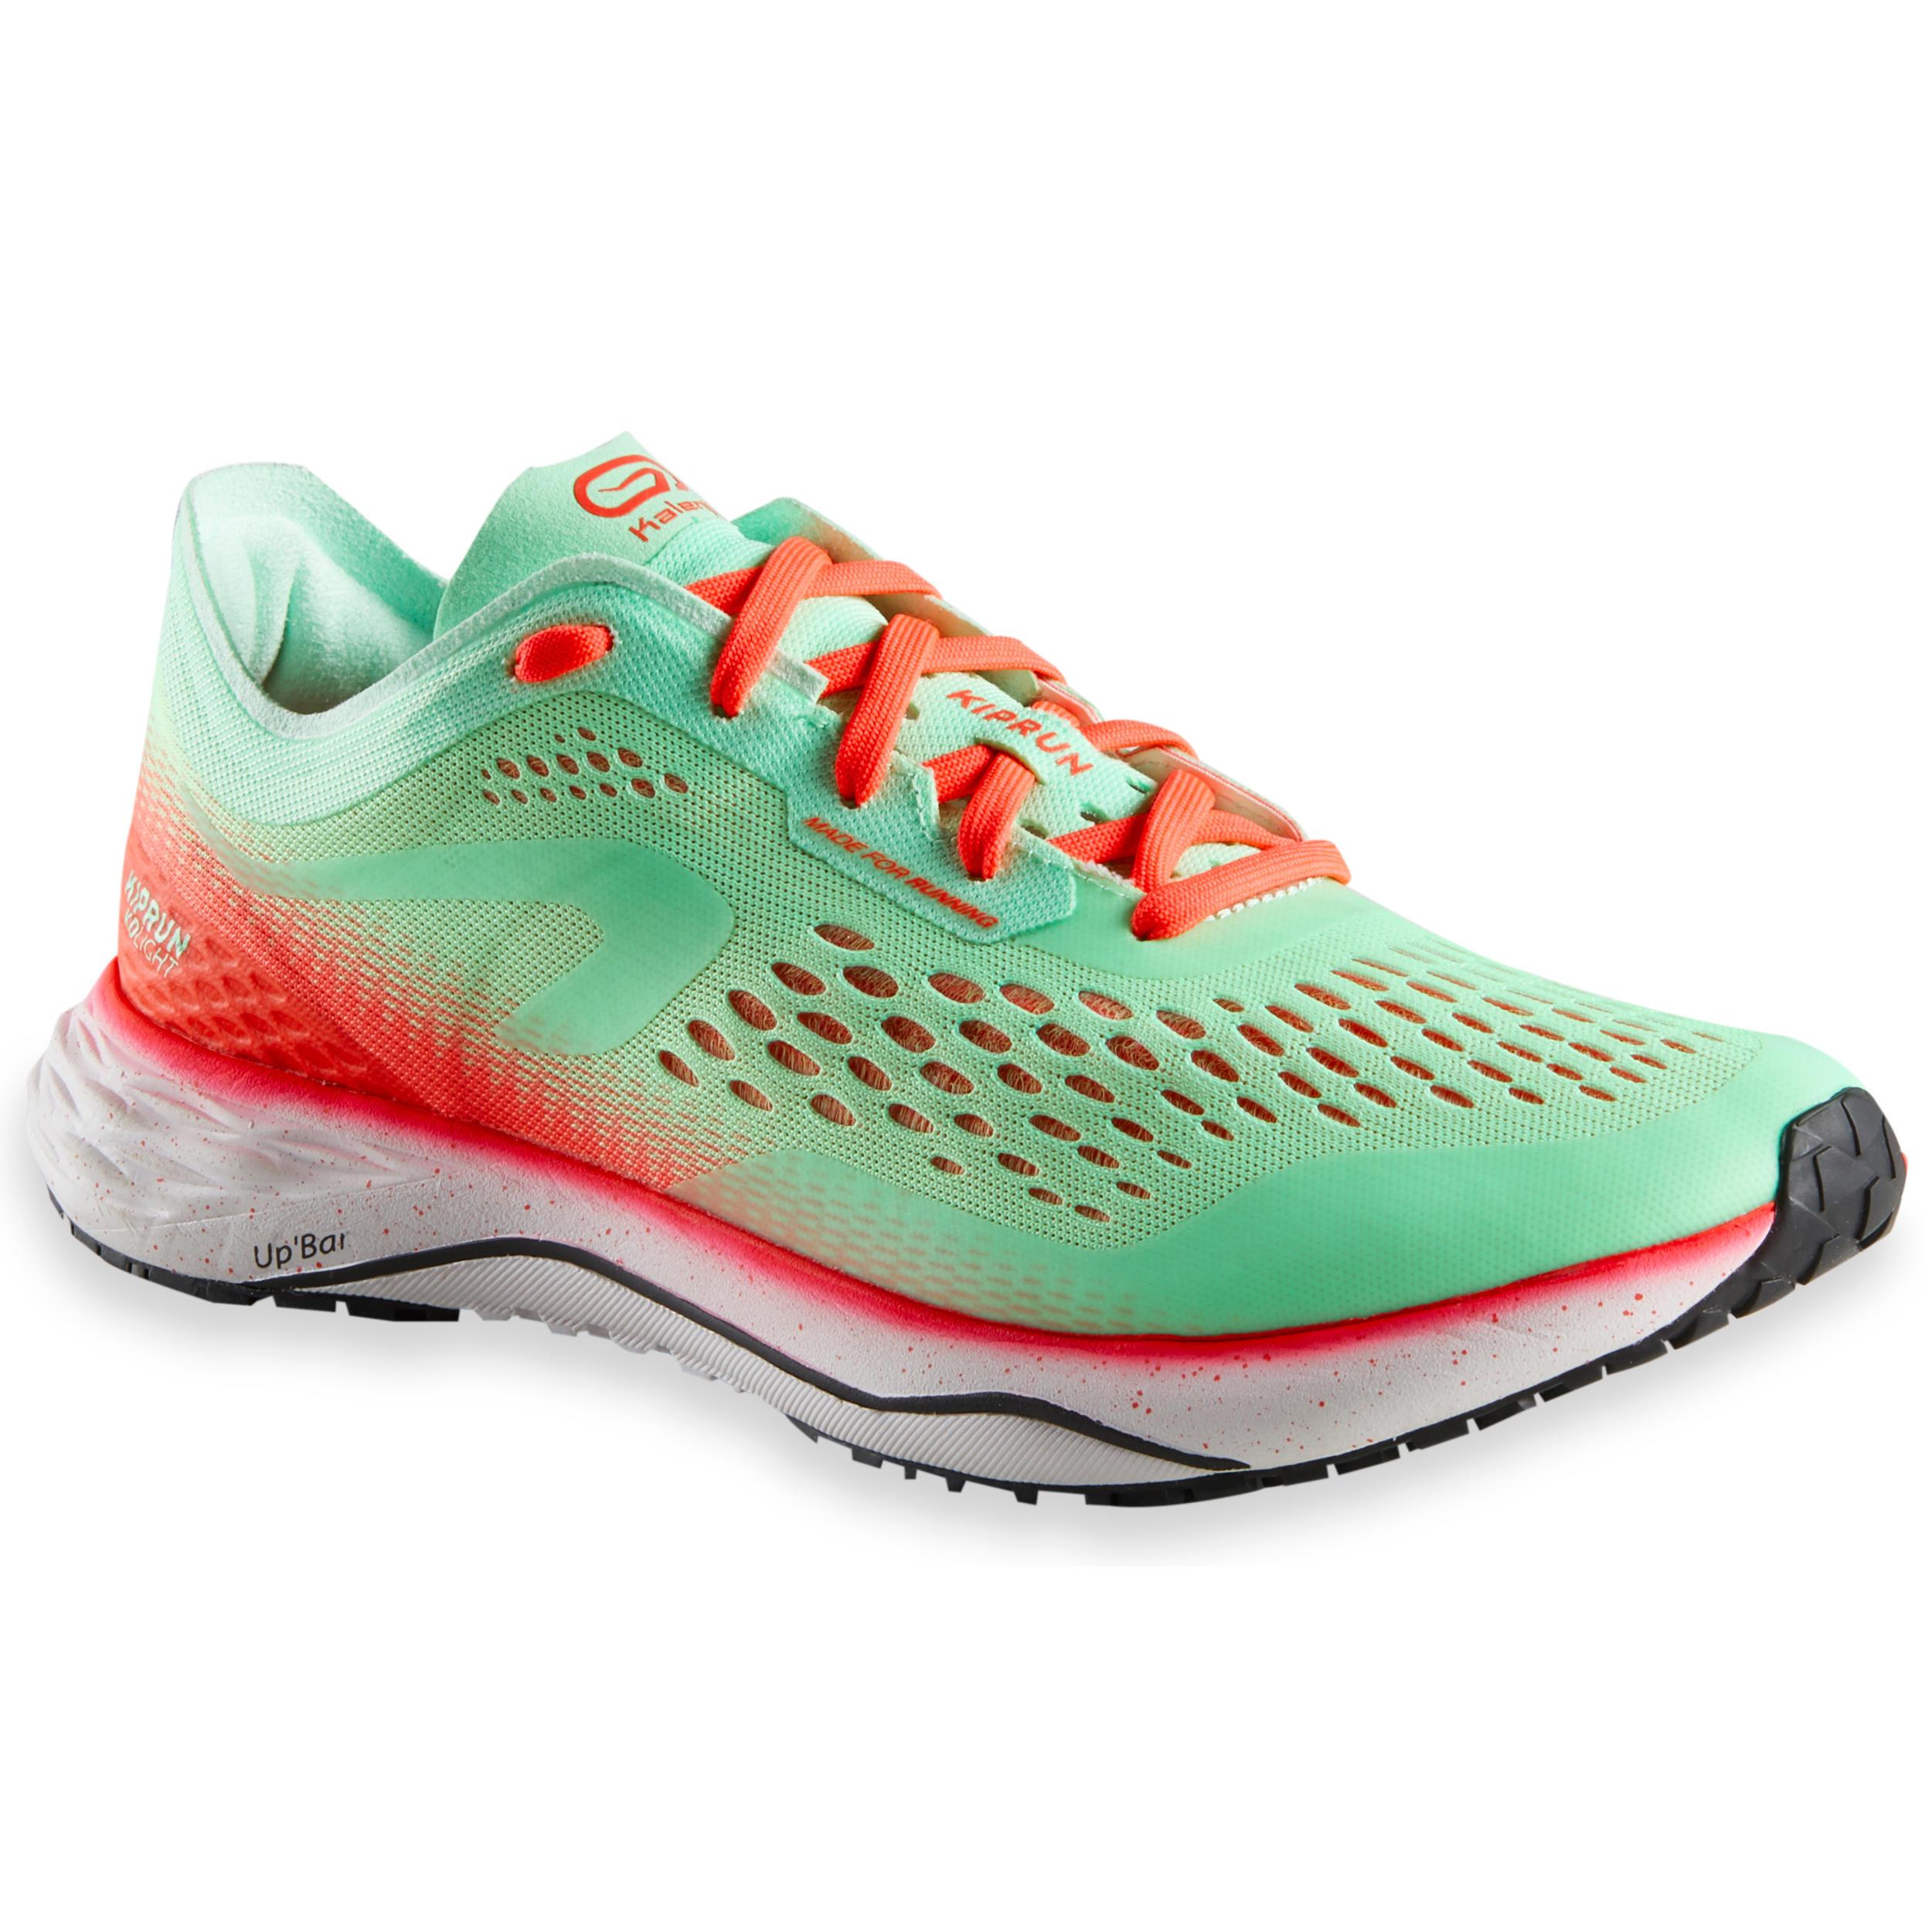 d49baae9 Comprar Zapatillas de Running Mujer Online   Decathlon